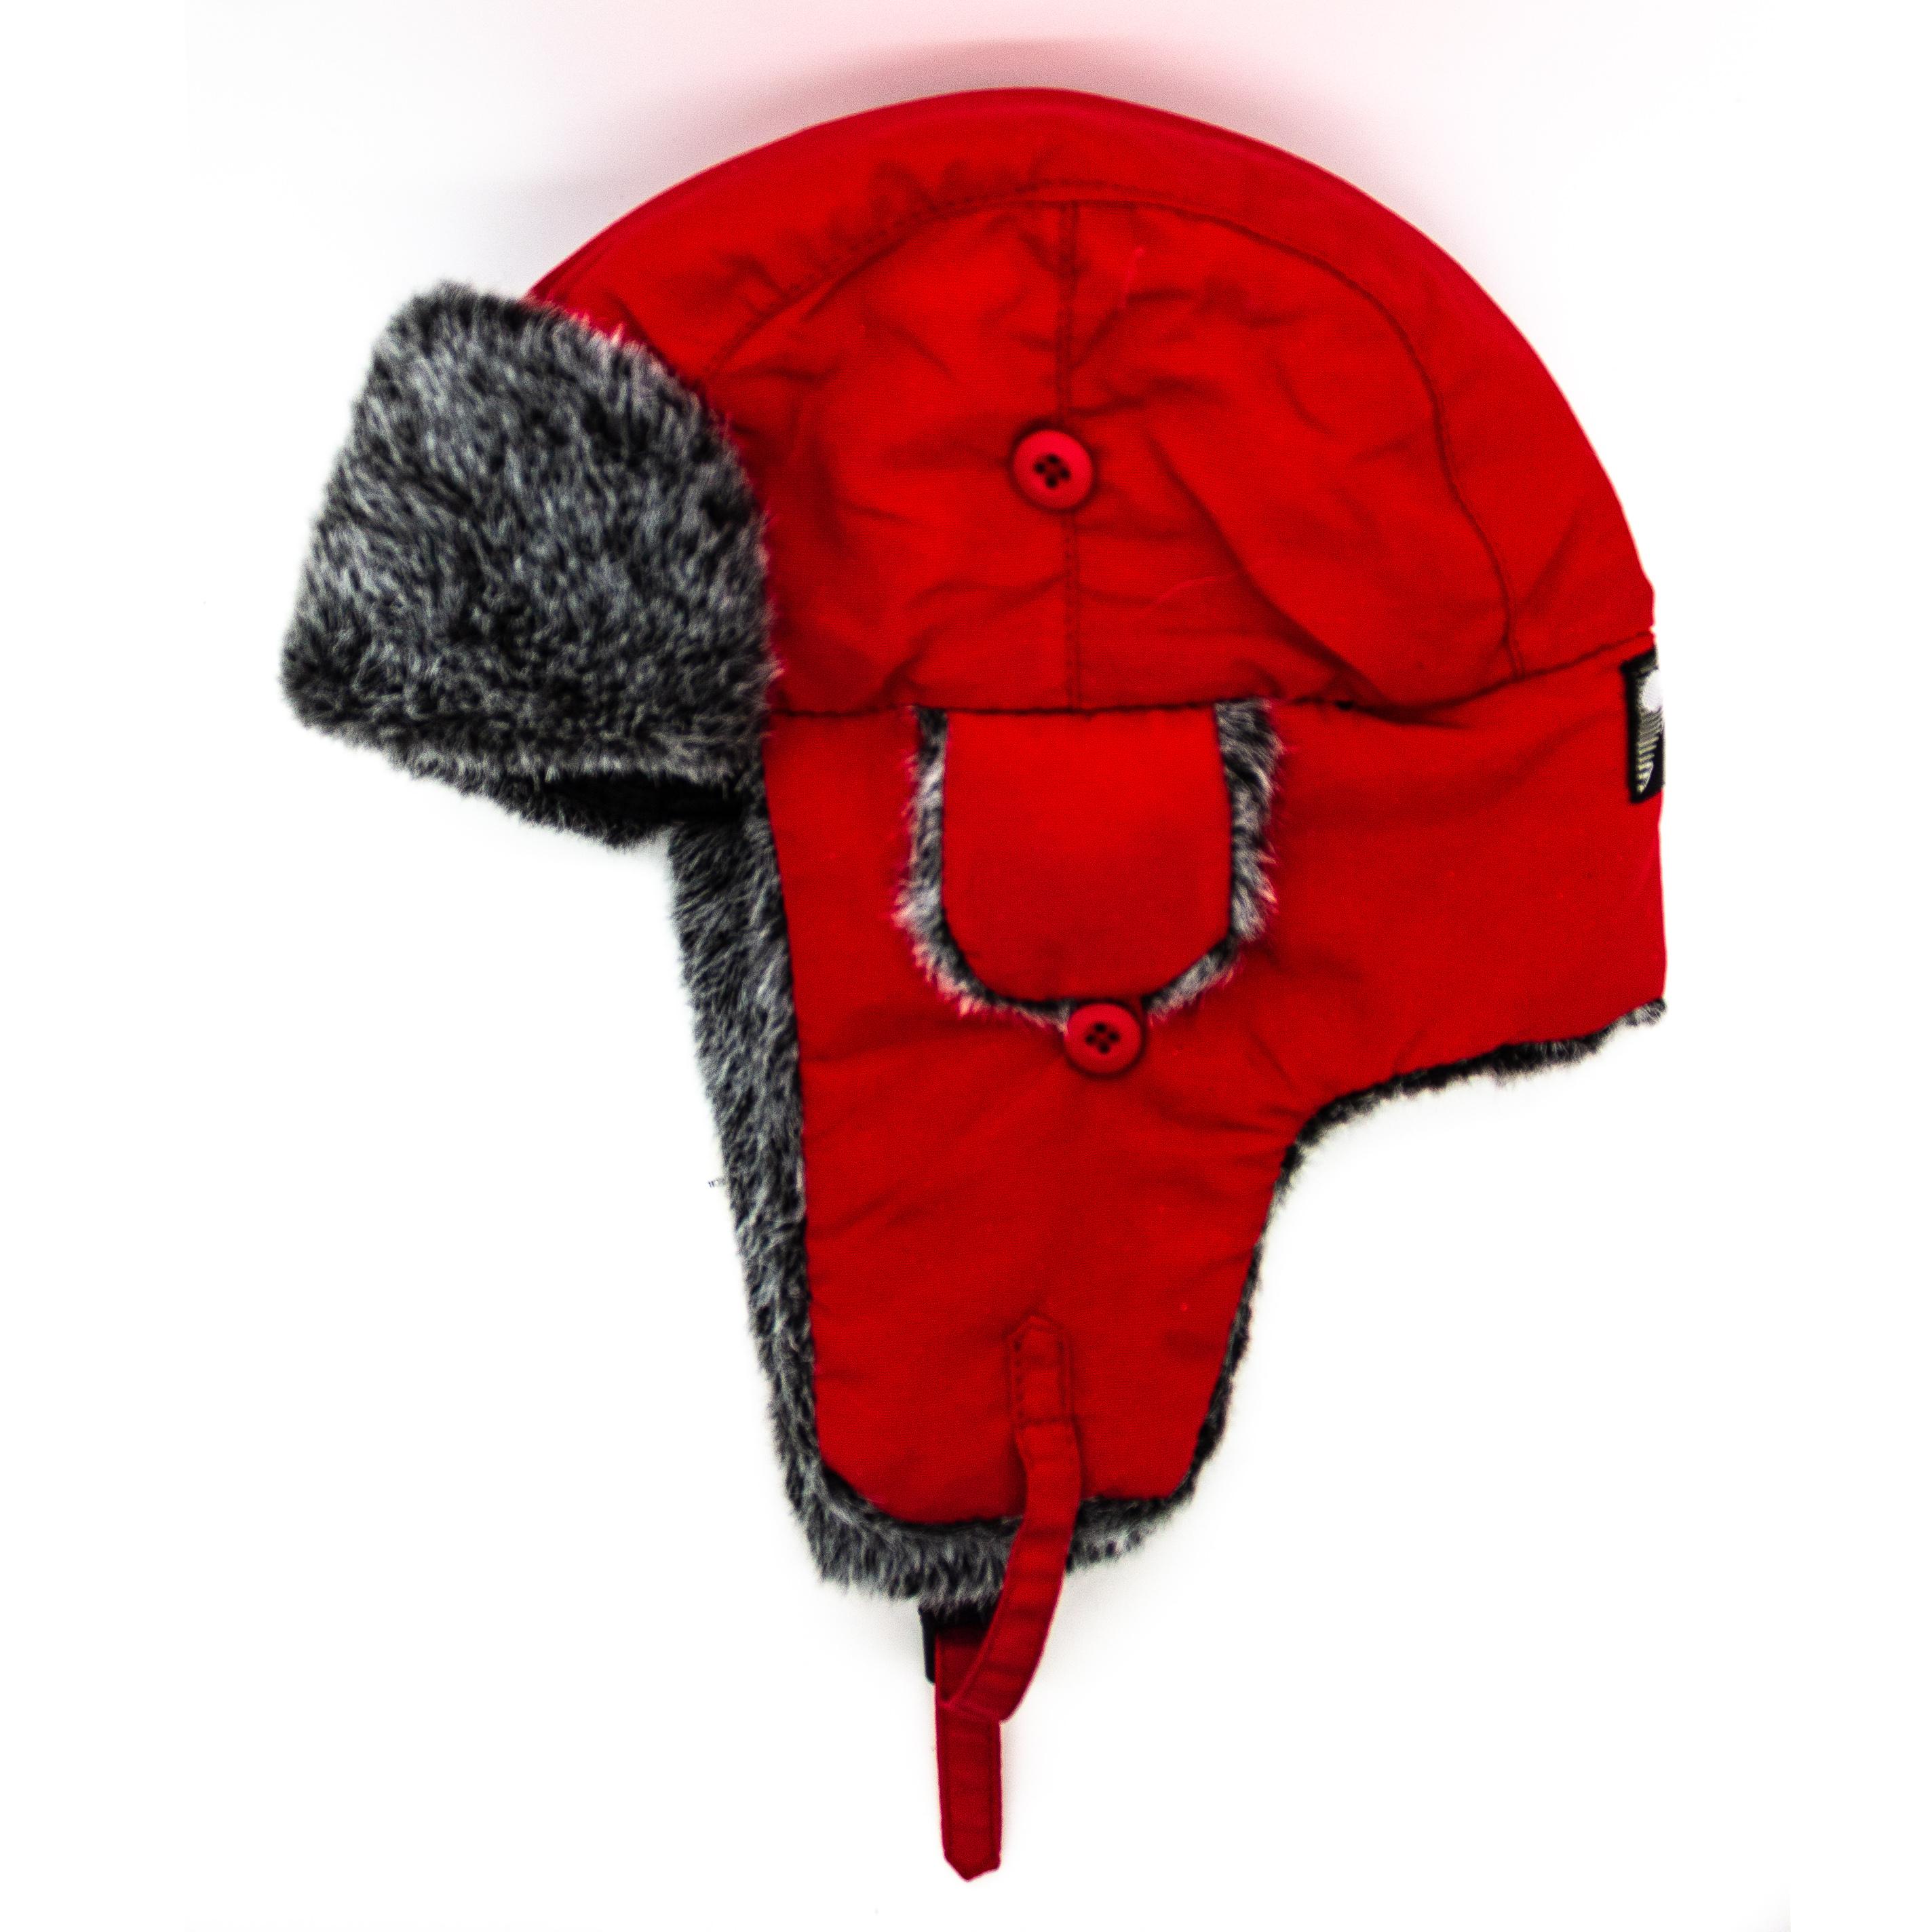 Talvihattu punainen